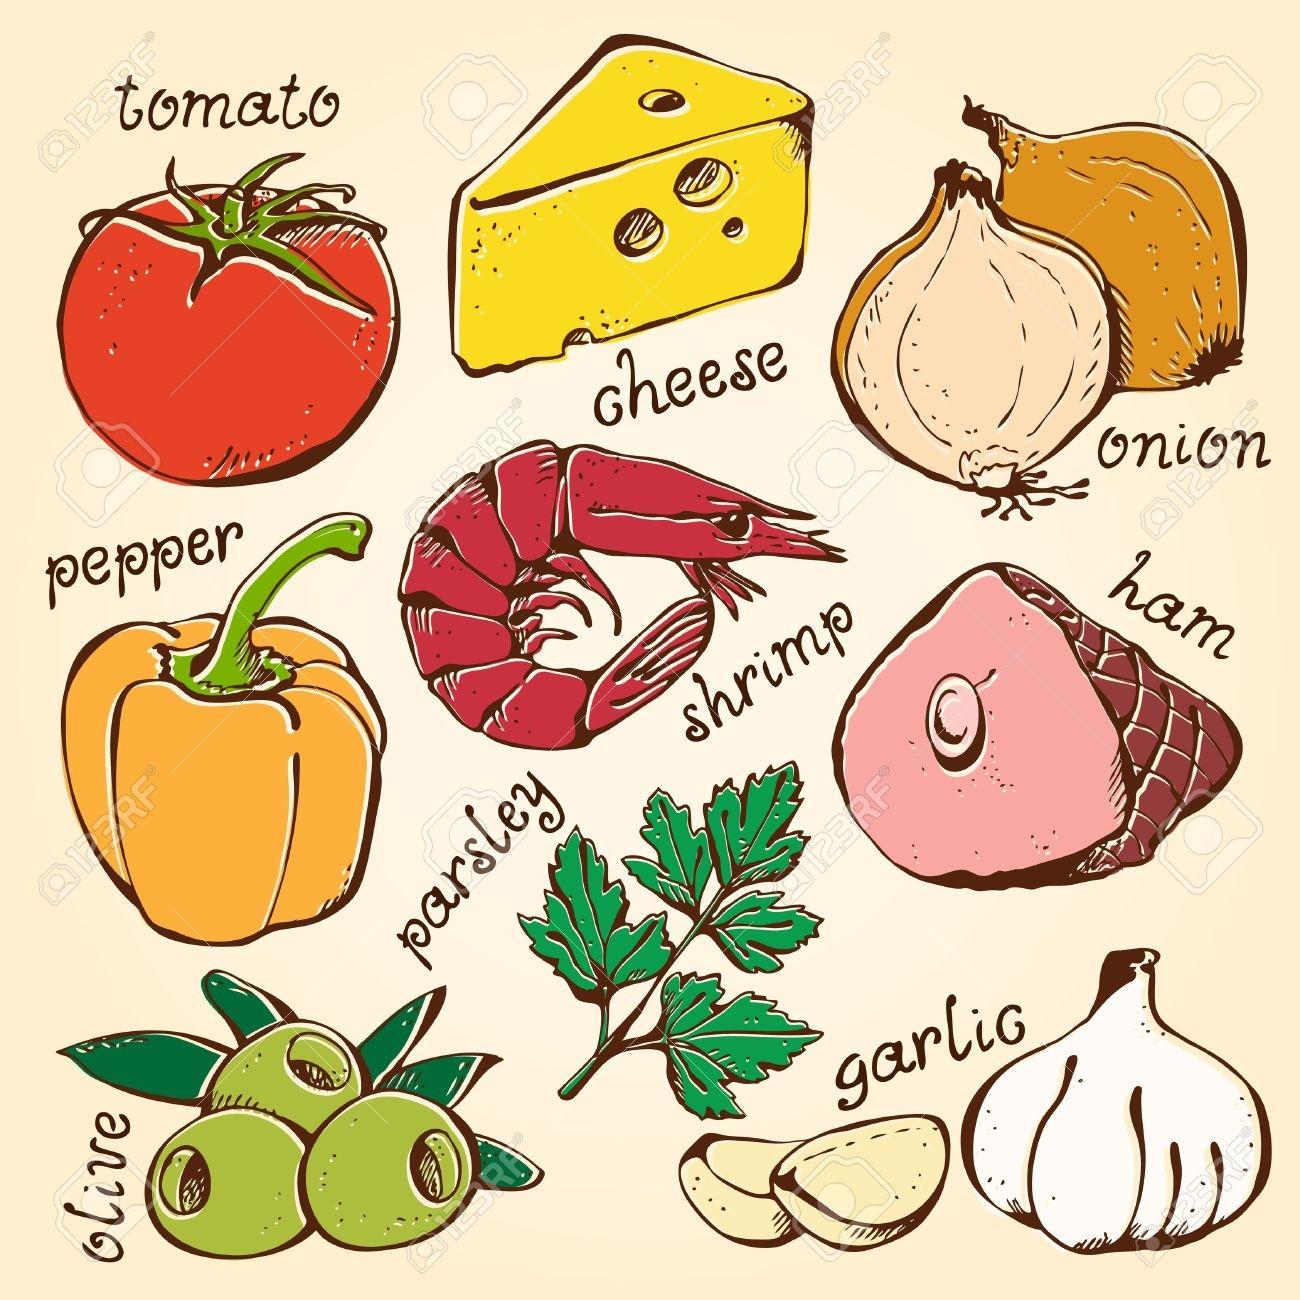 Food ingredient clipart jpg transparent Ingredients Clipart | Free download best Ingredients Clipart on ... jpg transparent